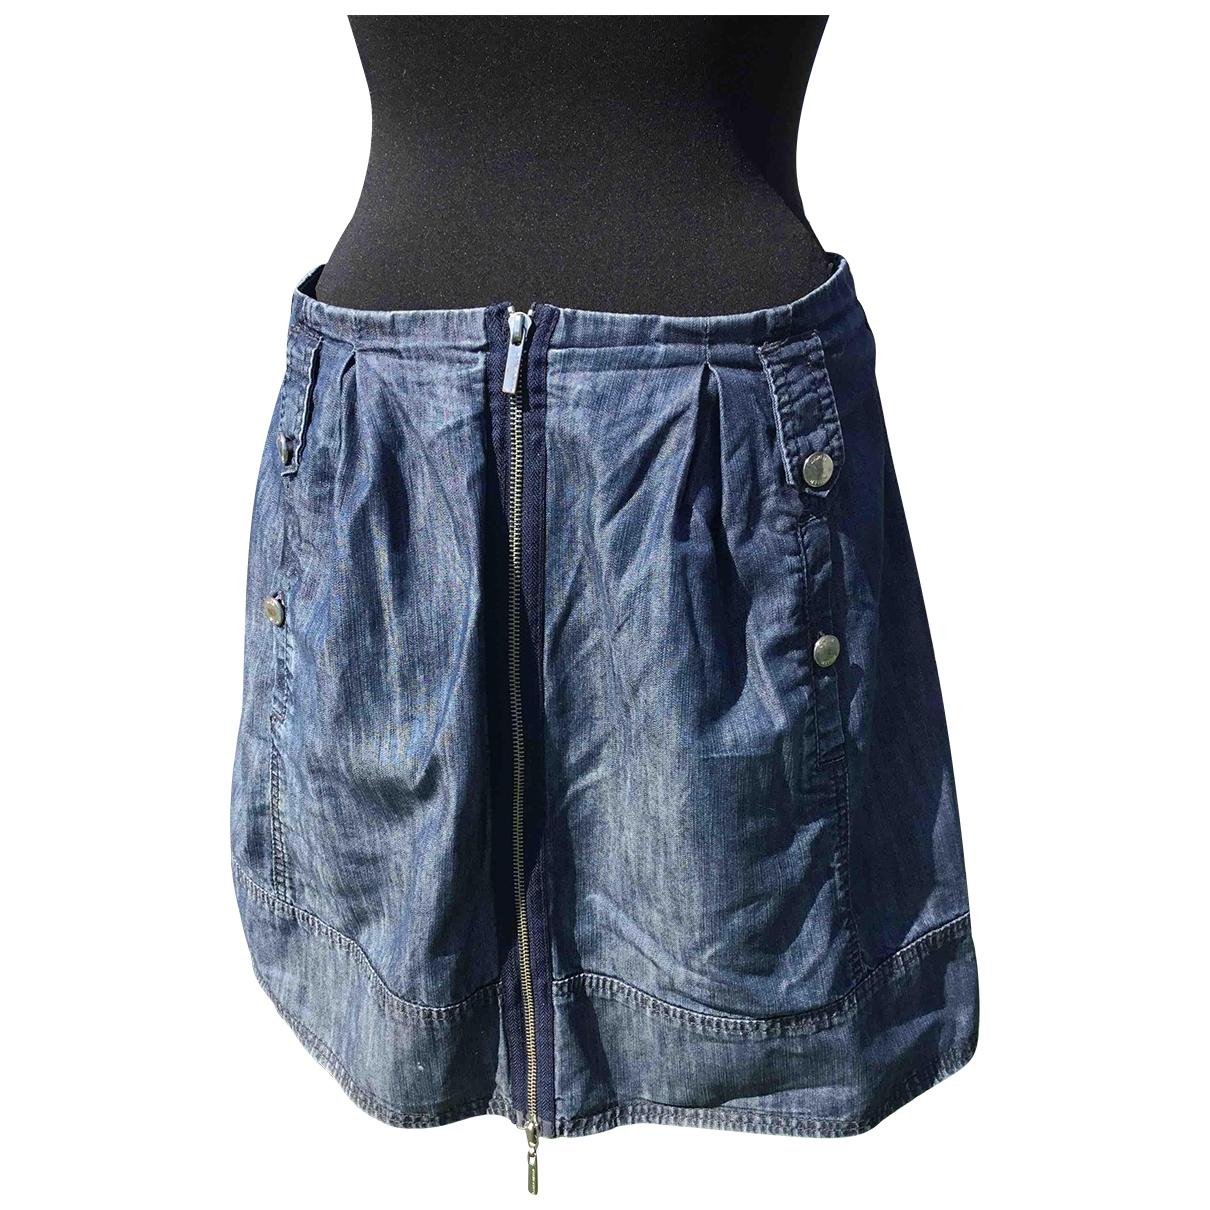 Karen Millen \N Blue Cotton skirt for Women 42 FR